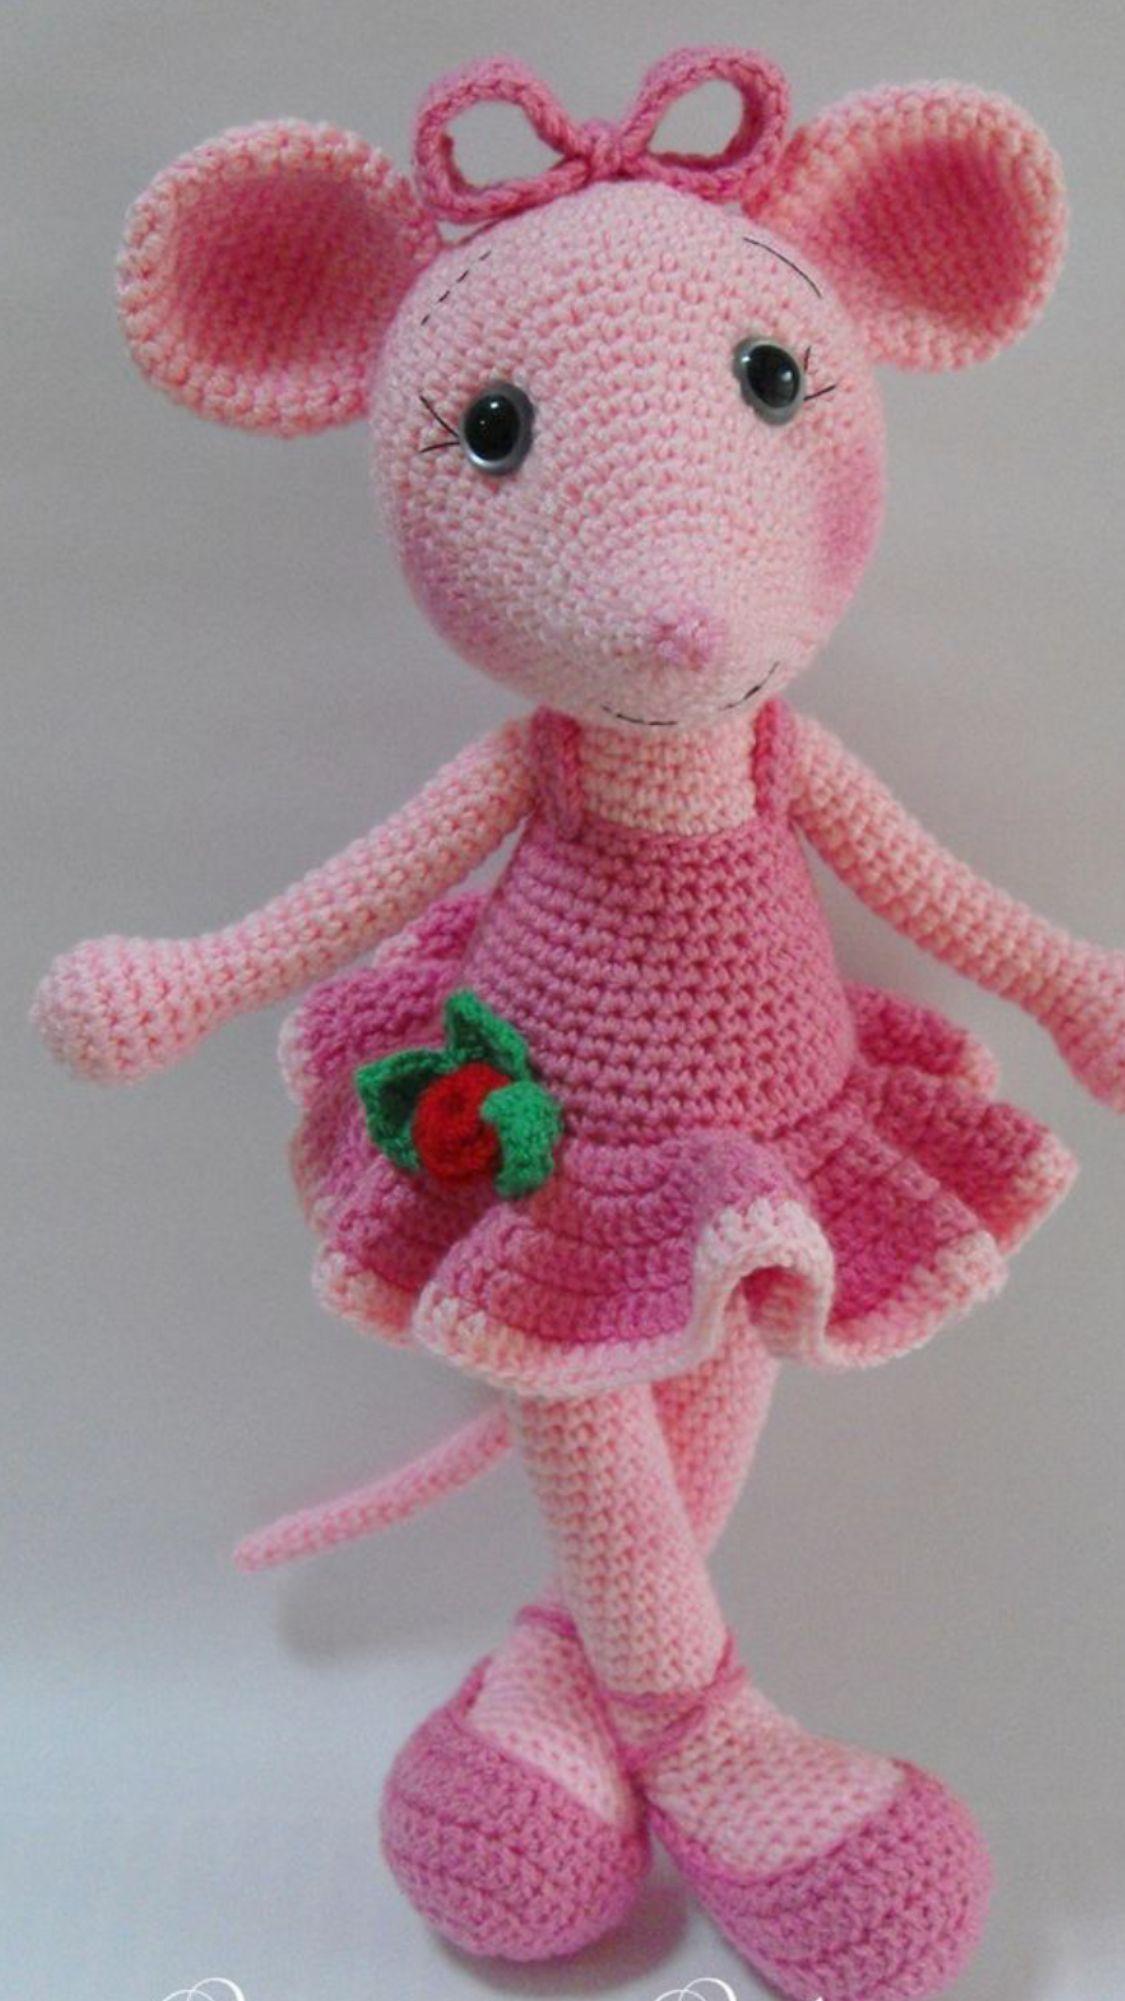 Oyuncak | Oyuncak | Pinterest | Amigurumi patterns, Crochet and Patterns